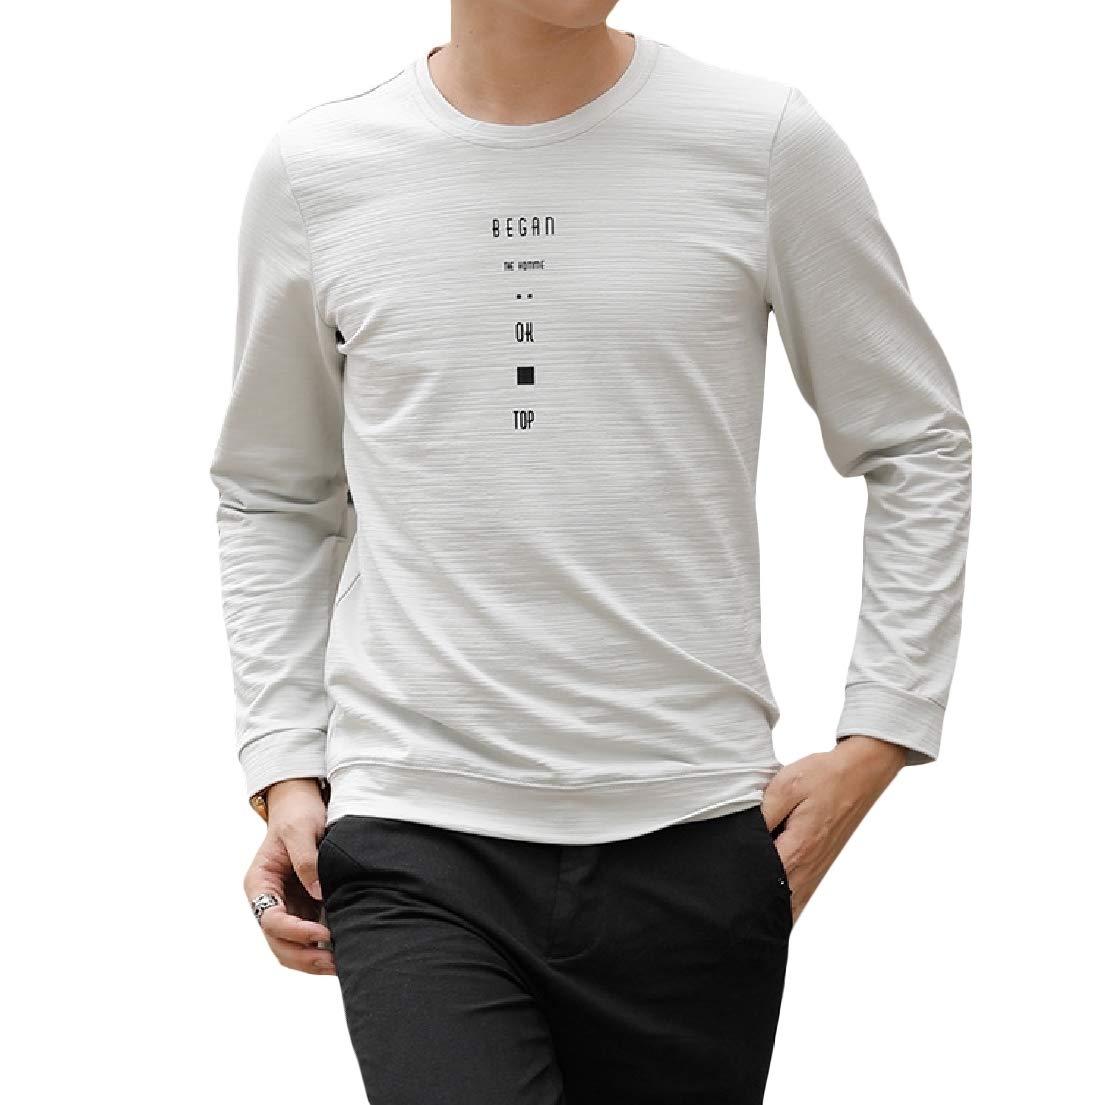 Vska Mens Print Crew-Neck Long Sleeve Leisure Comfort Sweatshirt